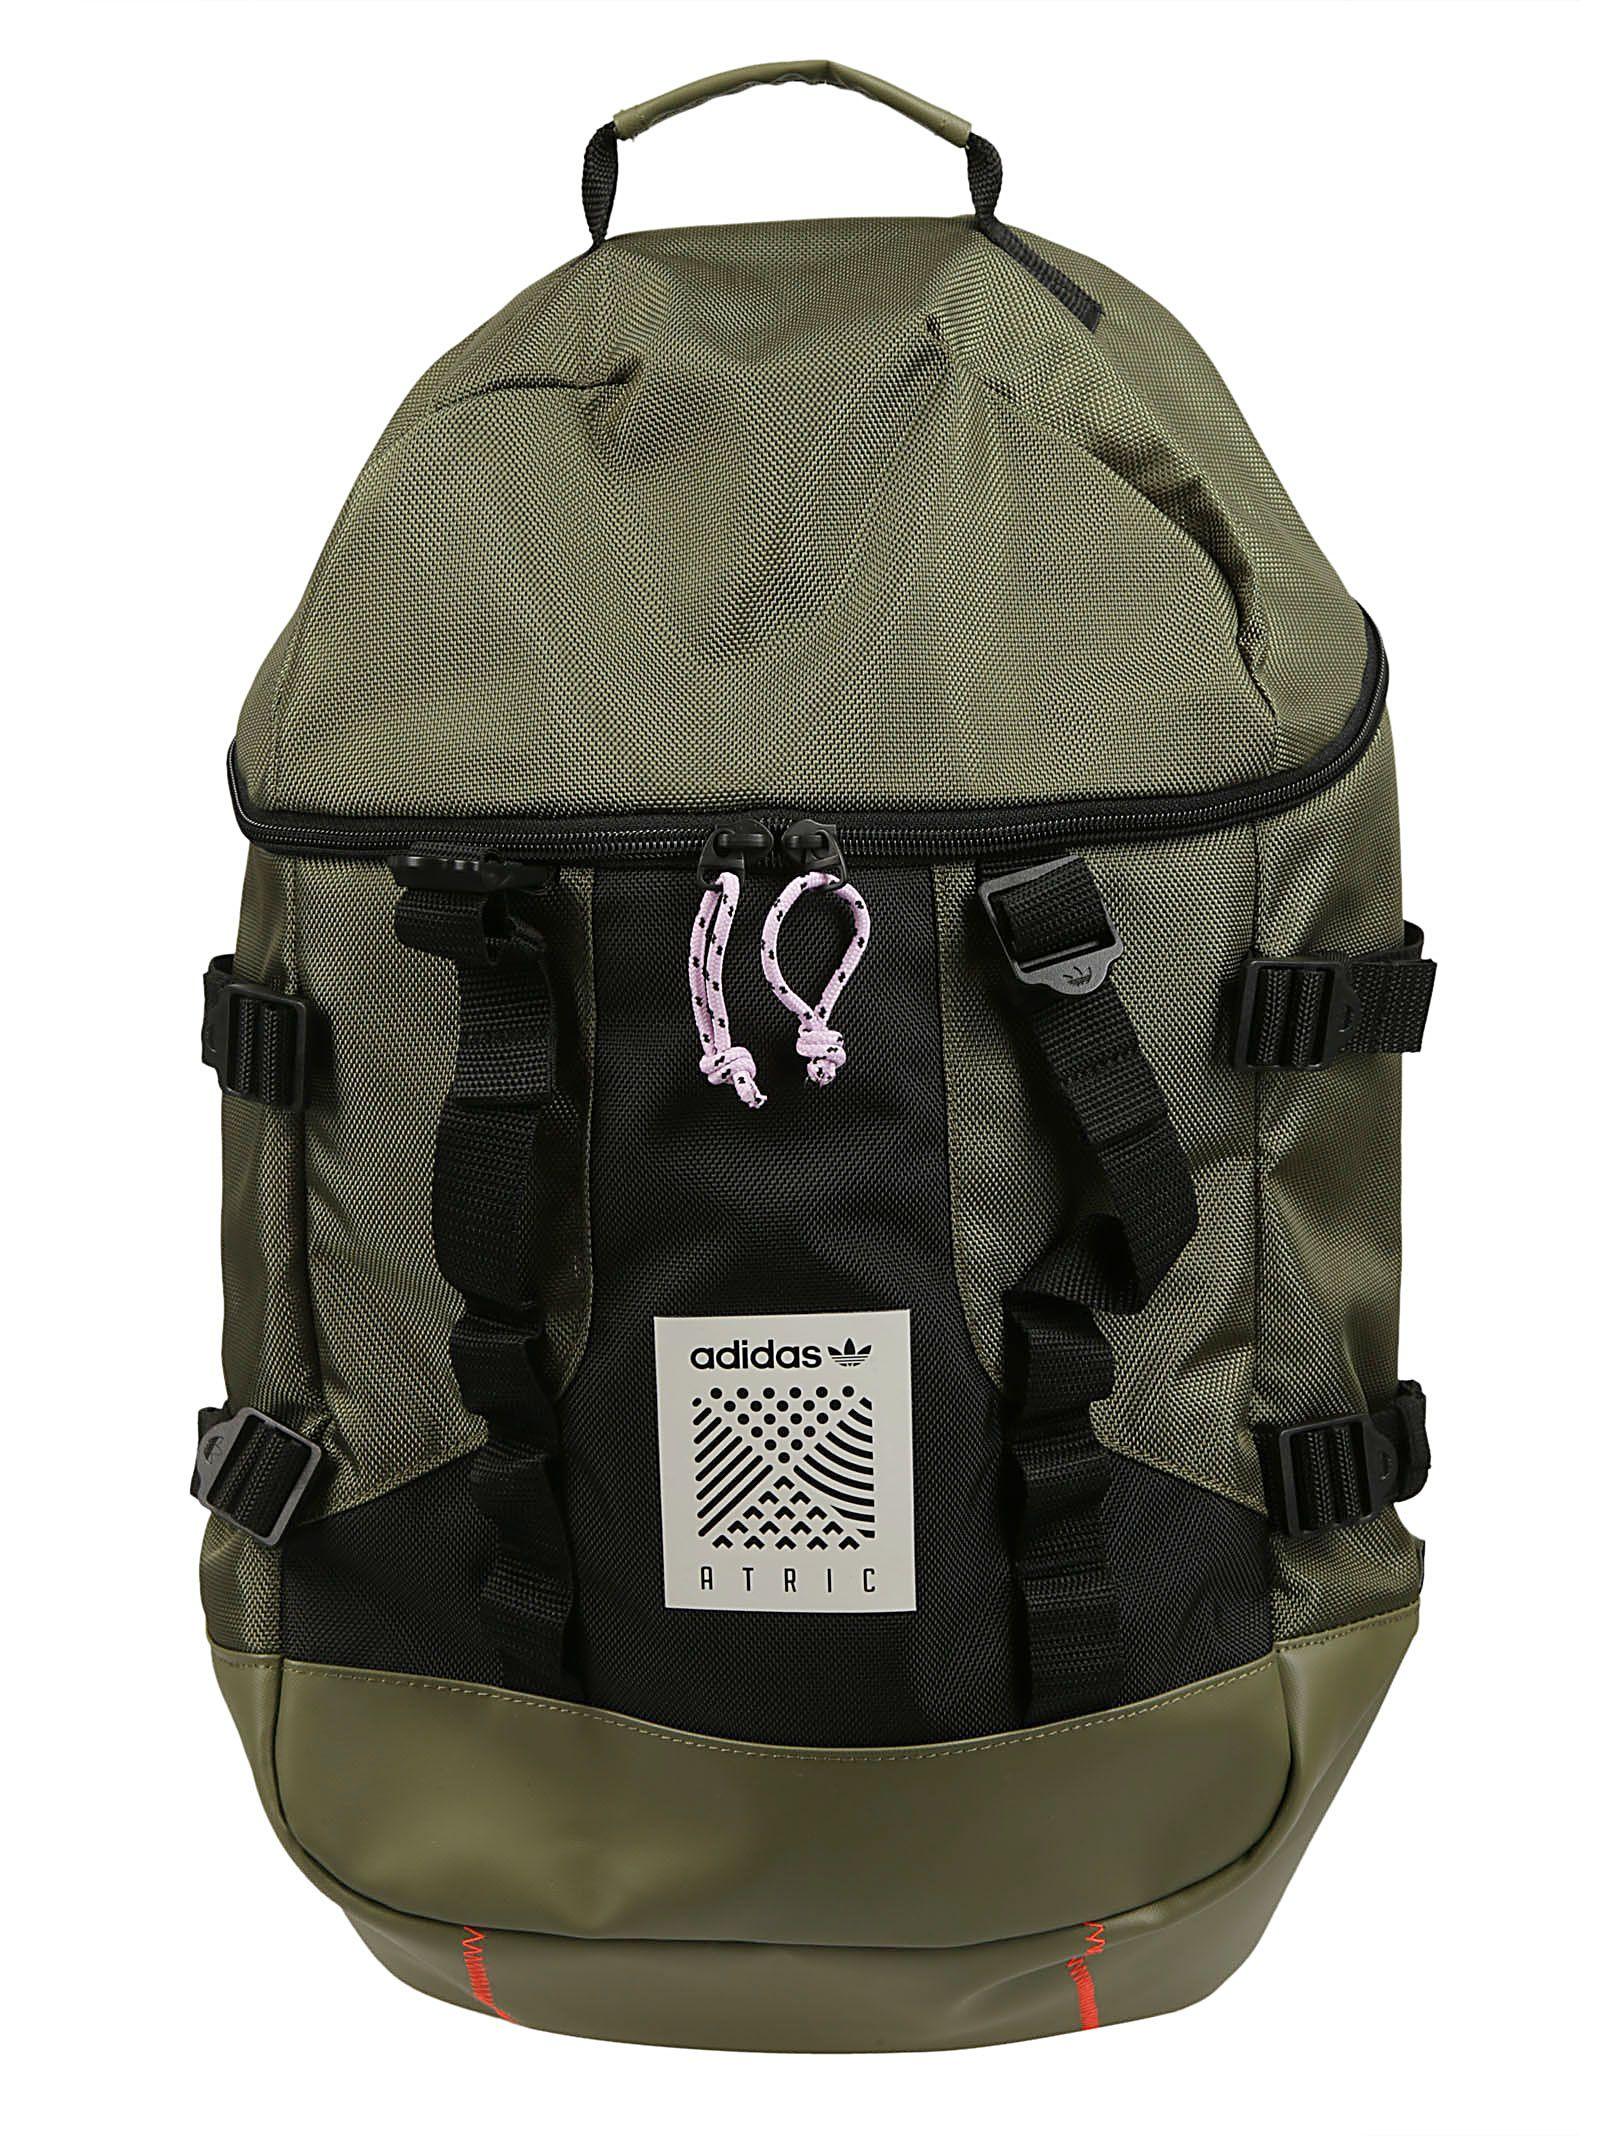 Adidas Originals Atric Backpack